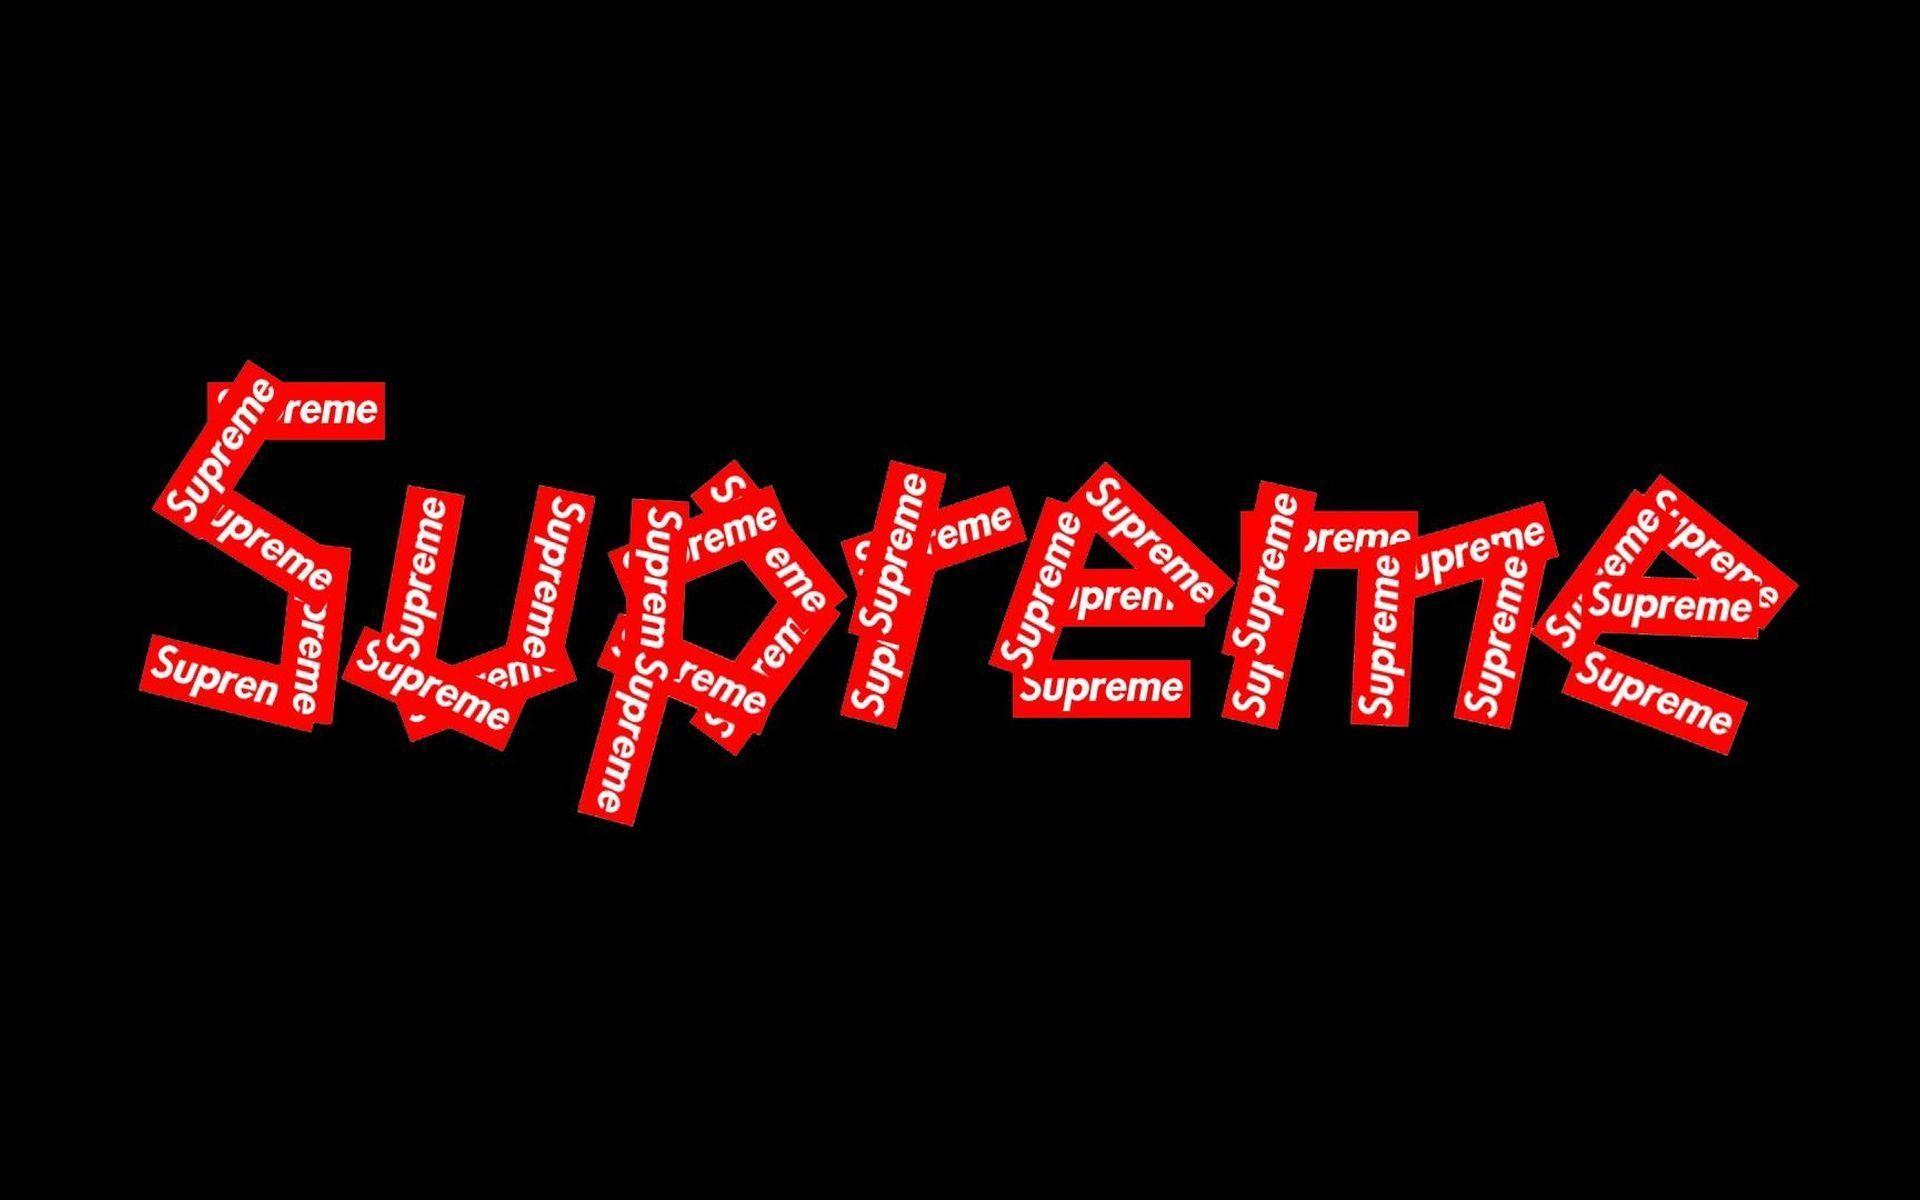 Supreme X BAPE Wallpapers - Top Free Supreme X BAPE ...